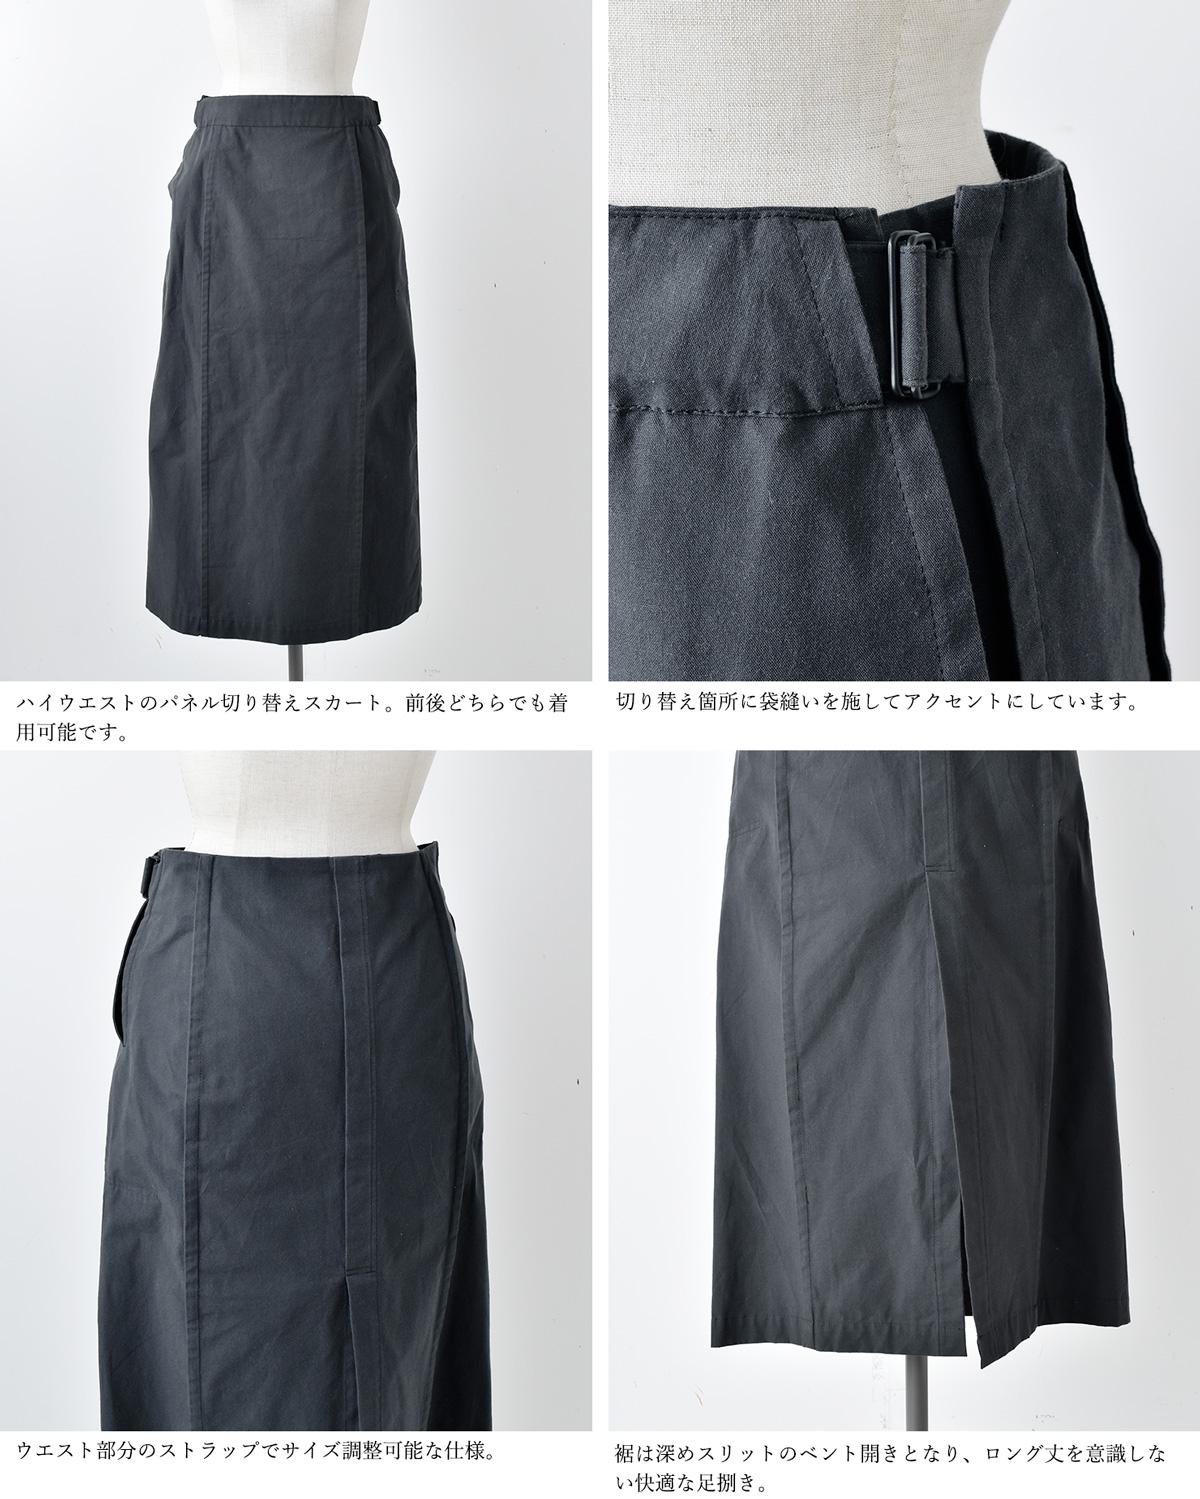 THE HINOKI(ザ ヒノキ)オーガニックコットンポプリンスカート th21s-15